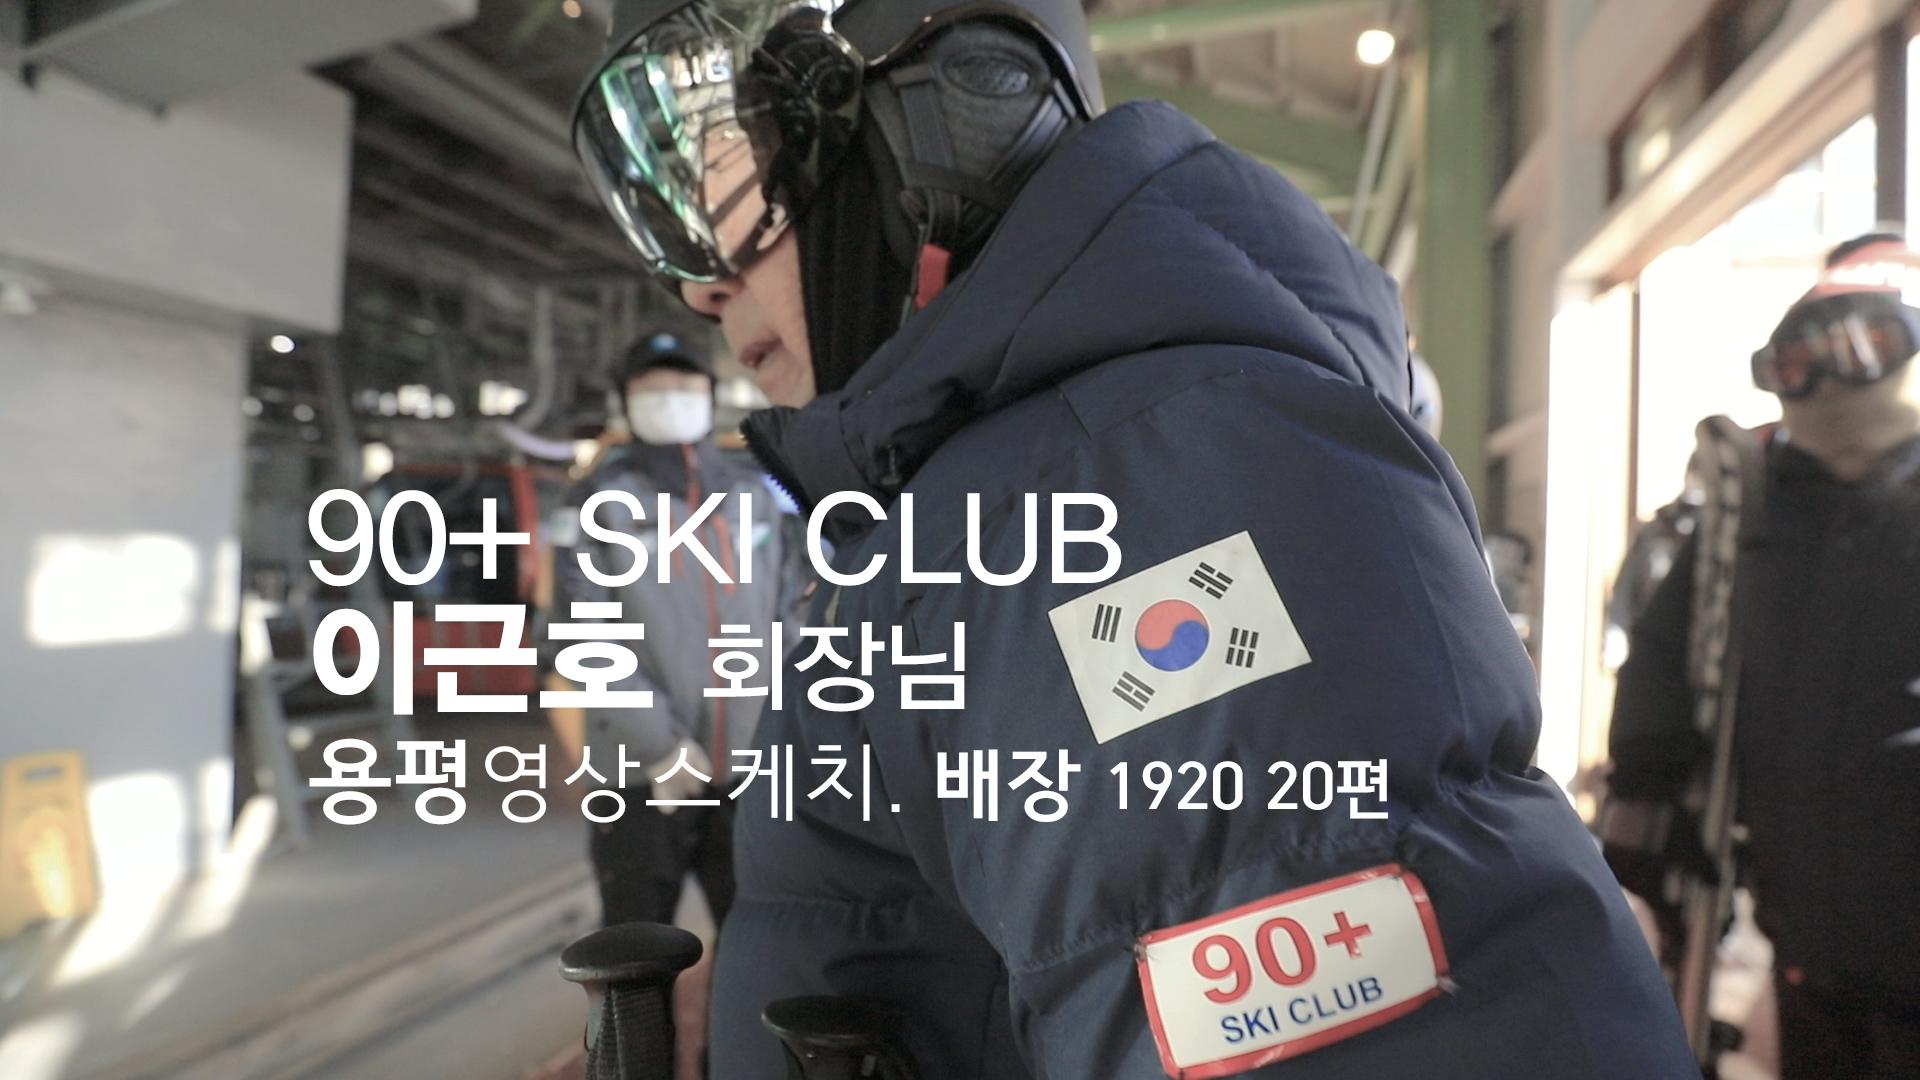 90+ SKI CLUB 이근호 회장님 _ 용평영상스케치. 배장 1920 20편